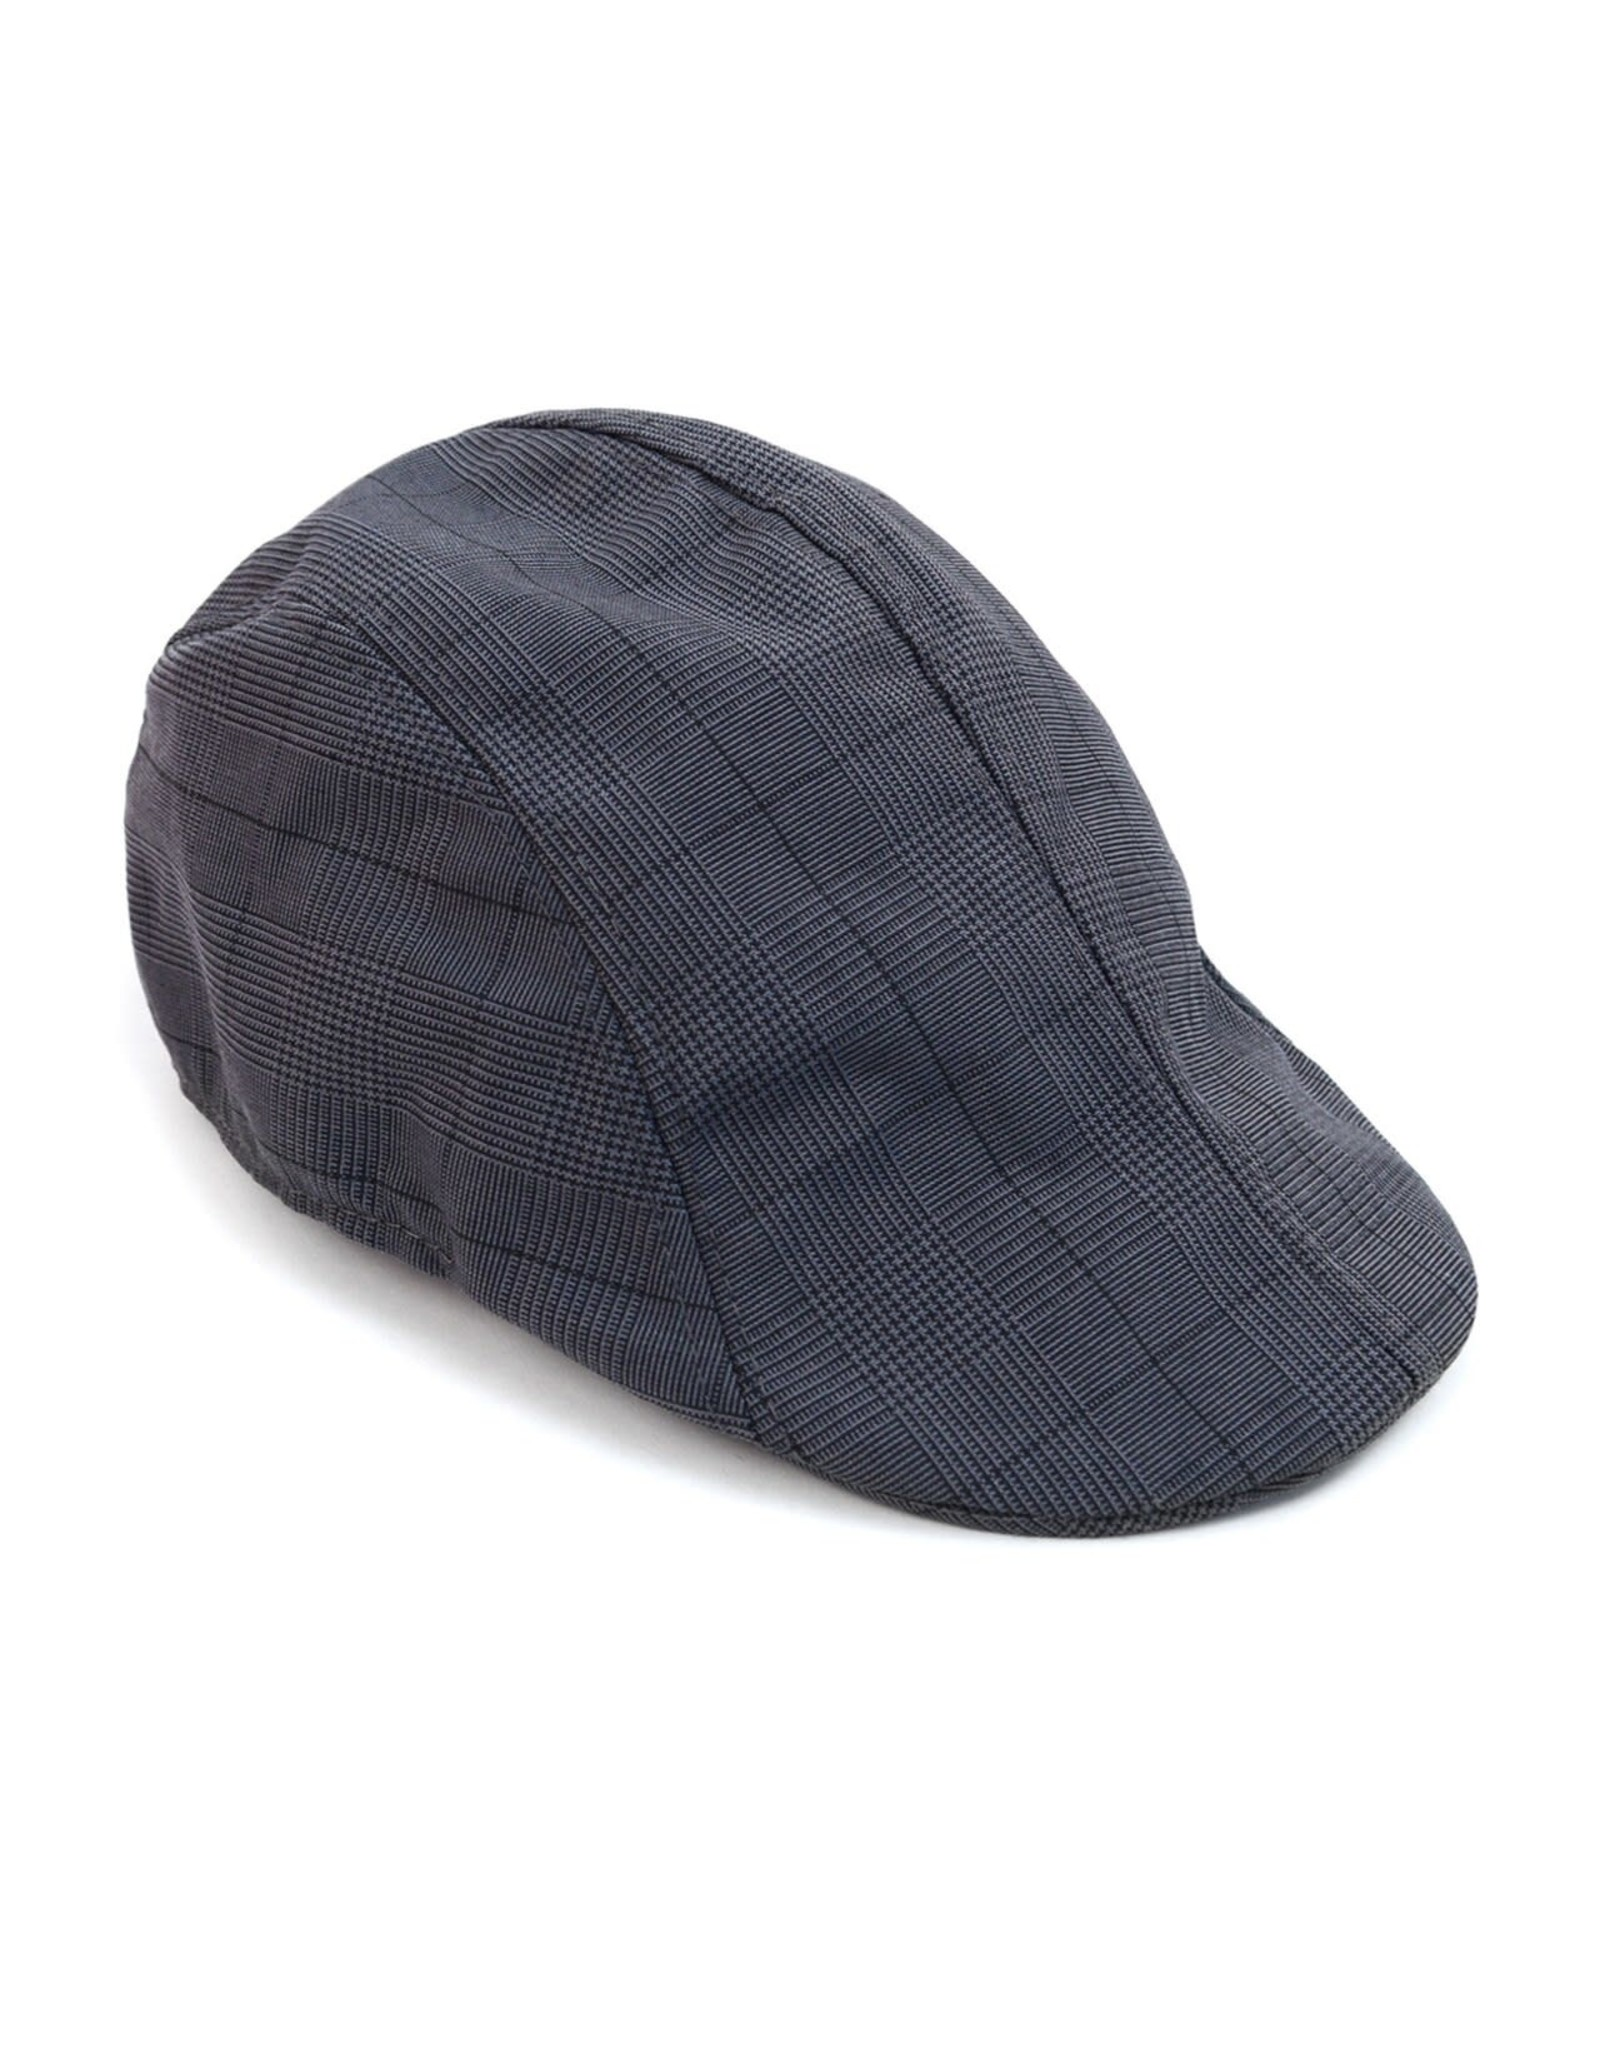 Selini New York '76 Plaid Ivy Hat Gray